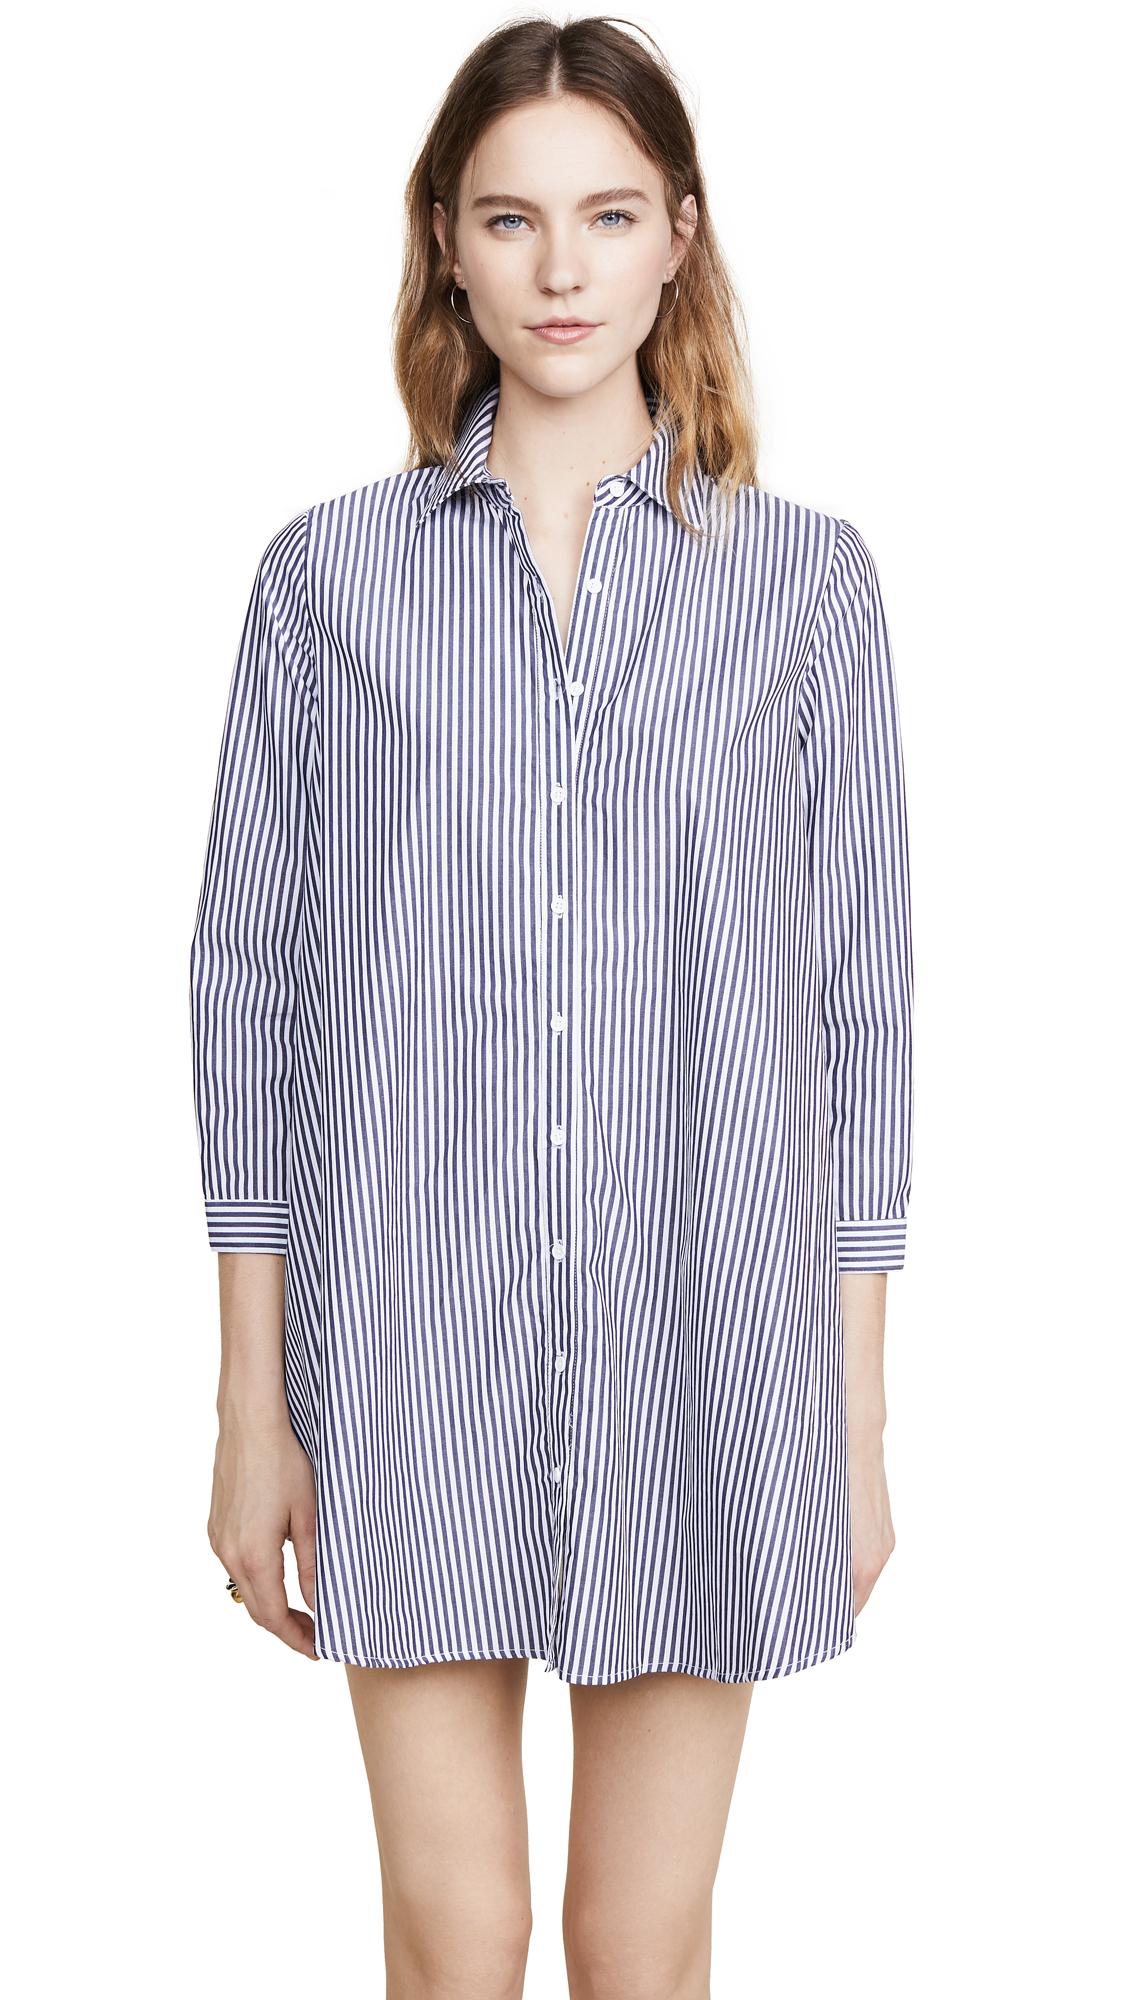 BB Dakota Olsen Shirtdress In Sailor Blue